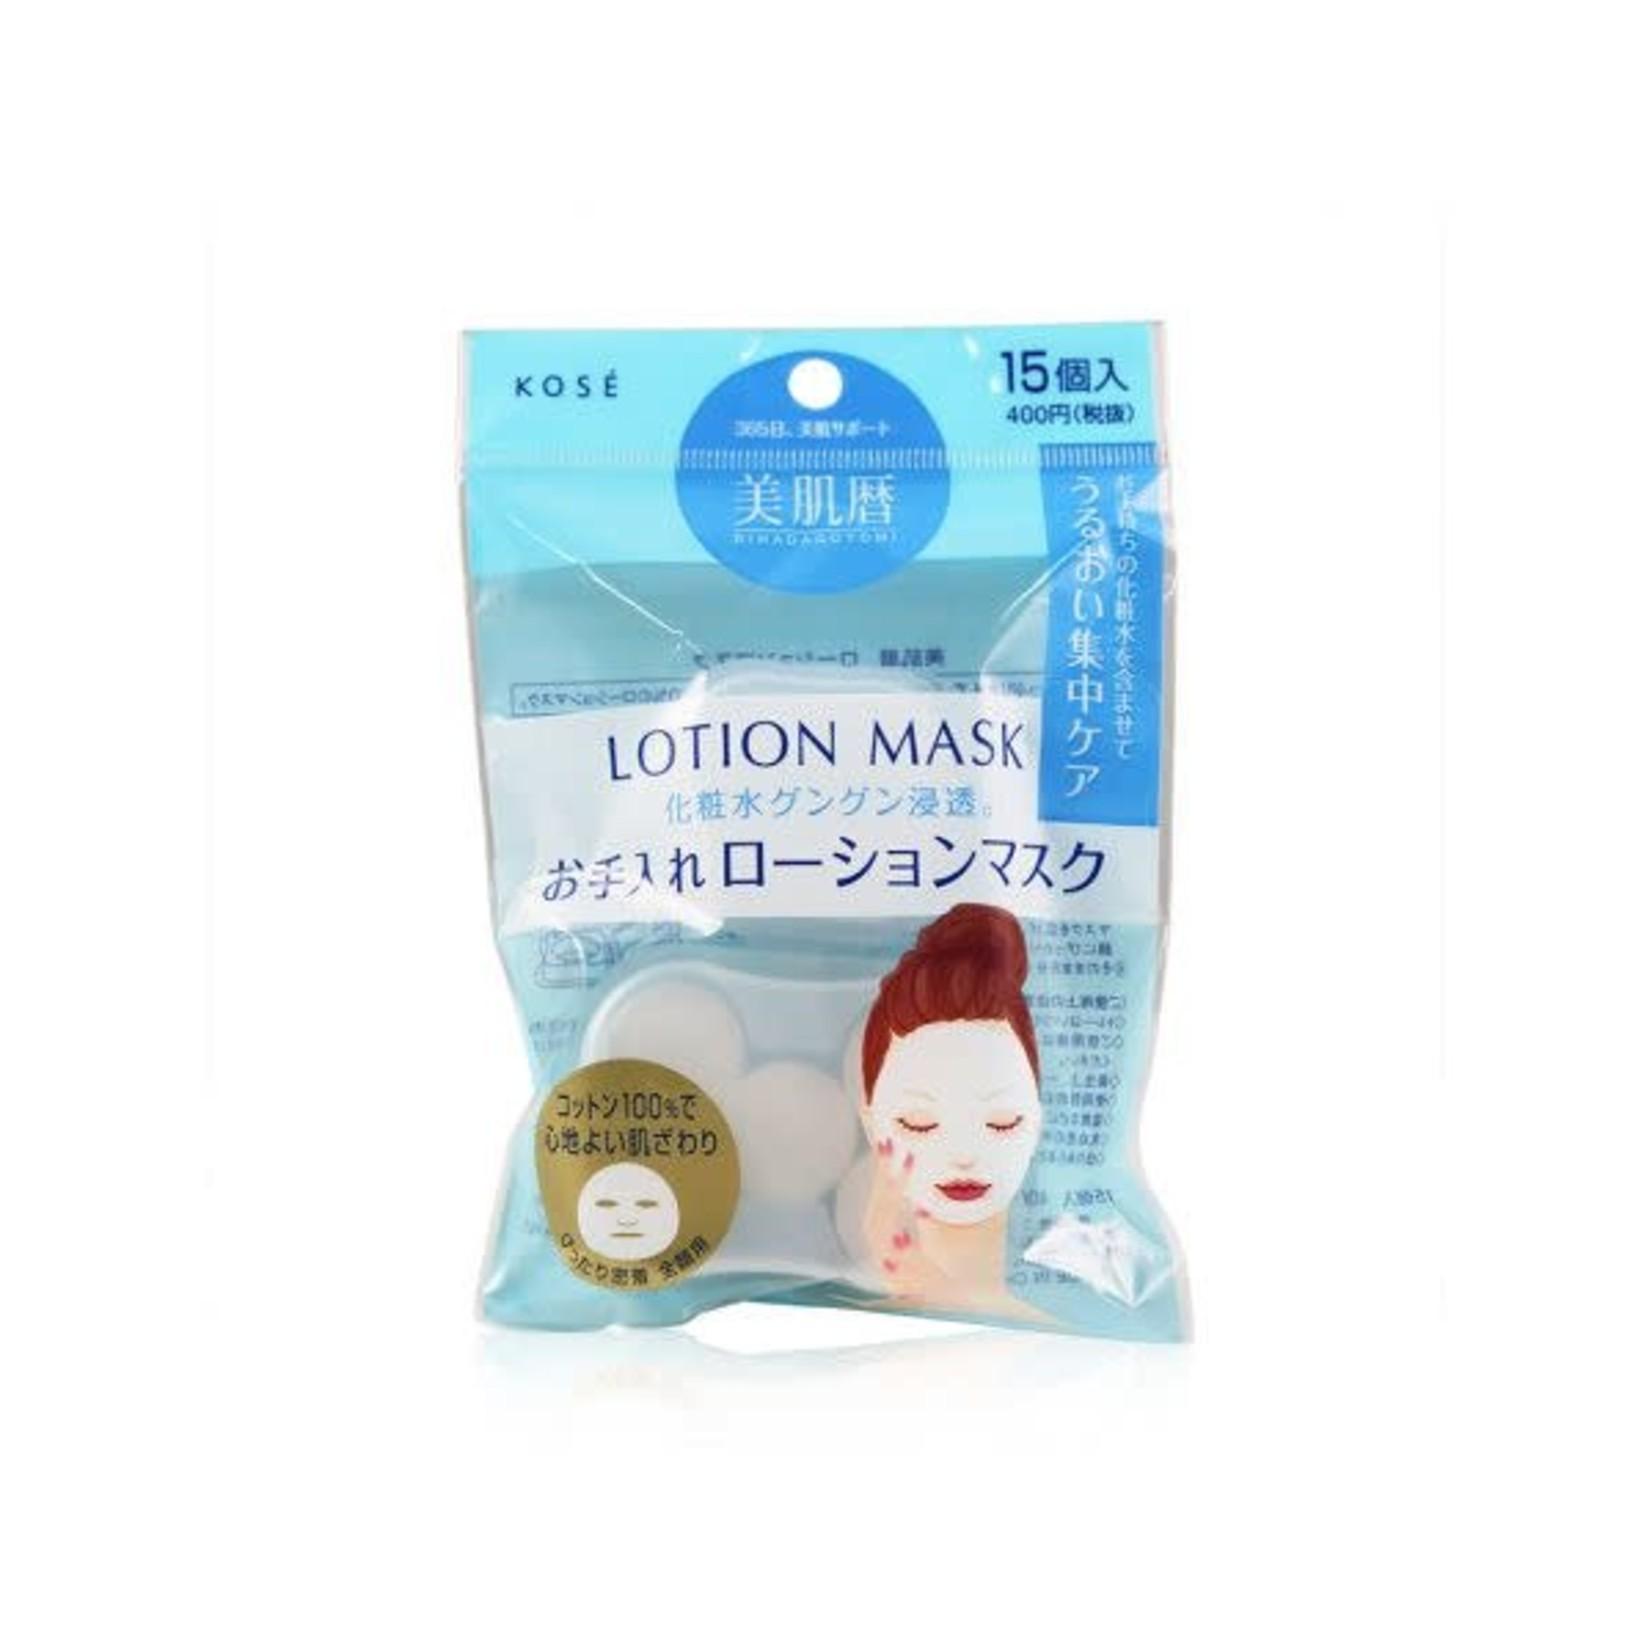 Kose Kose Sekkisei Lotion Mask 15pcs